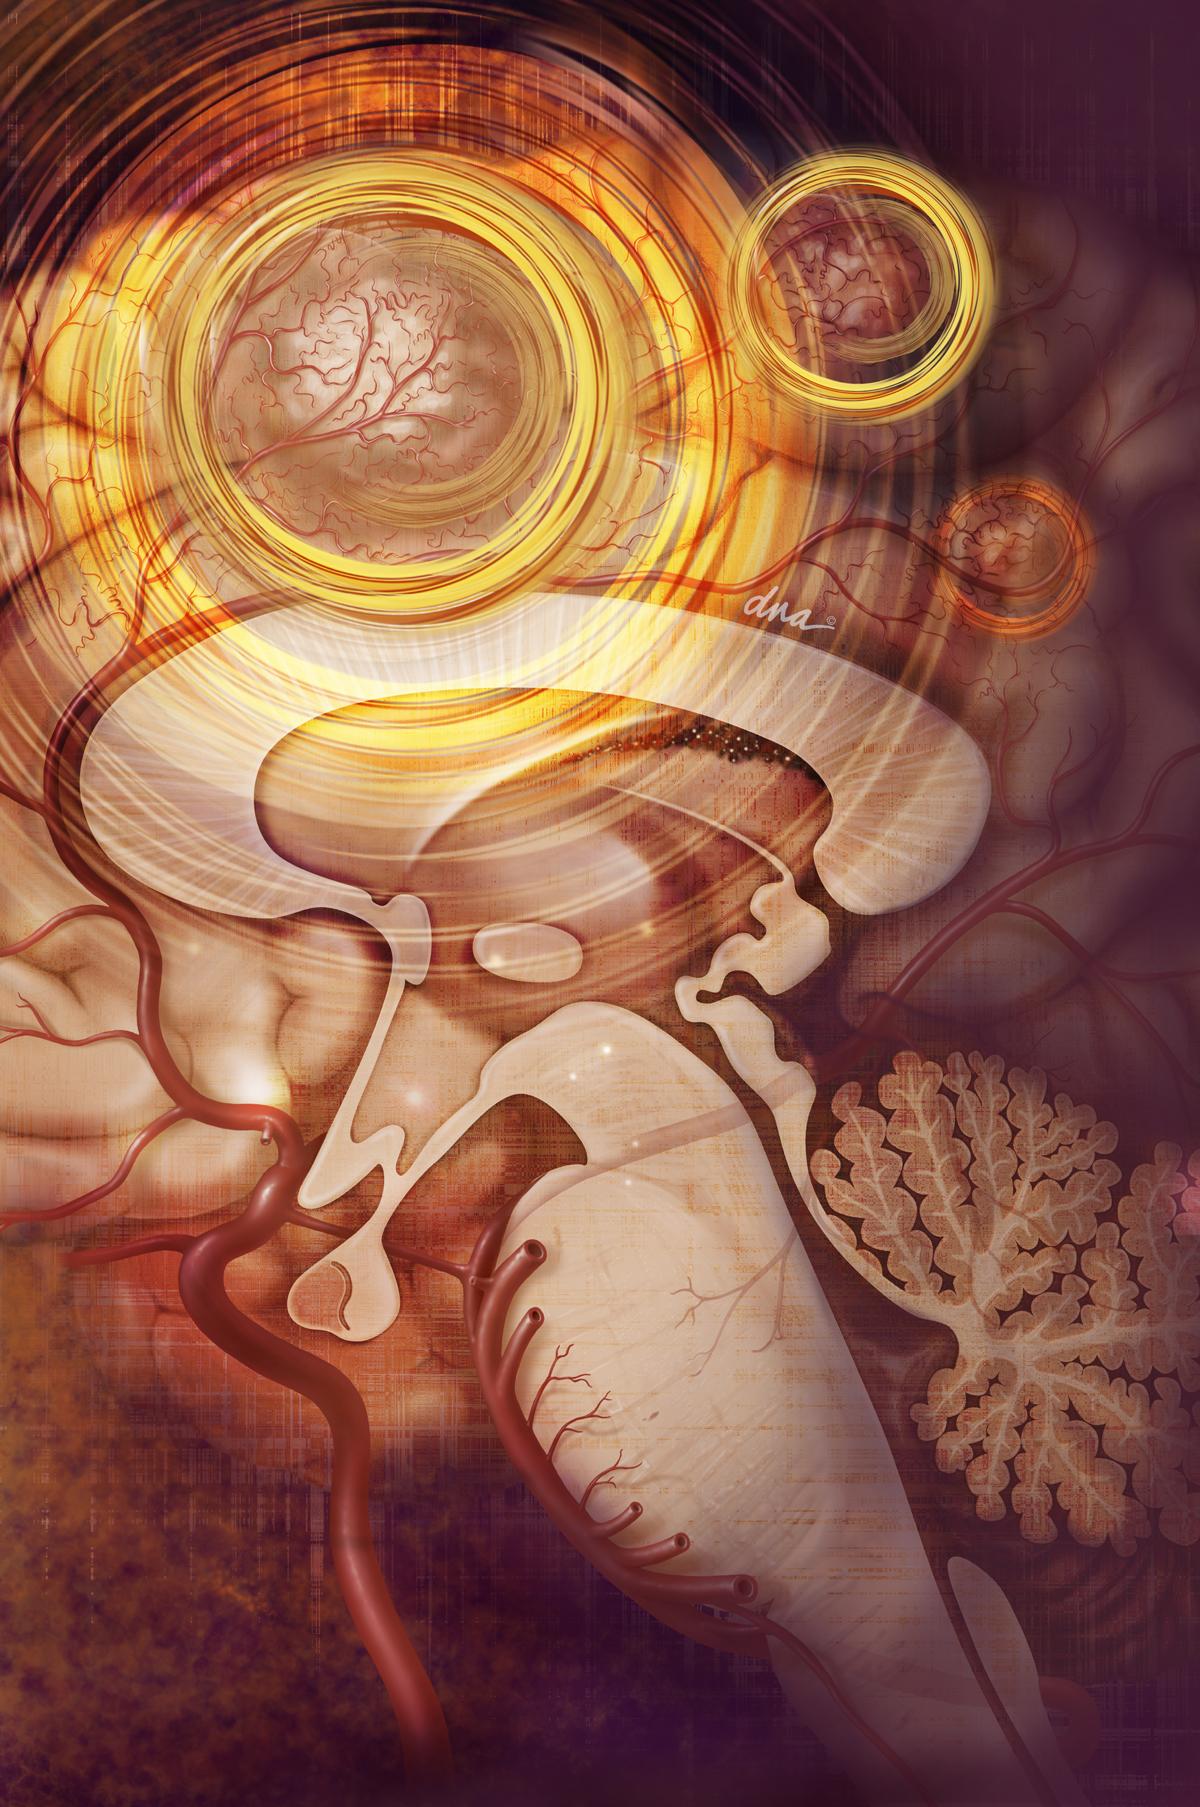 Tumor Illustration - Science Source